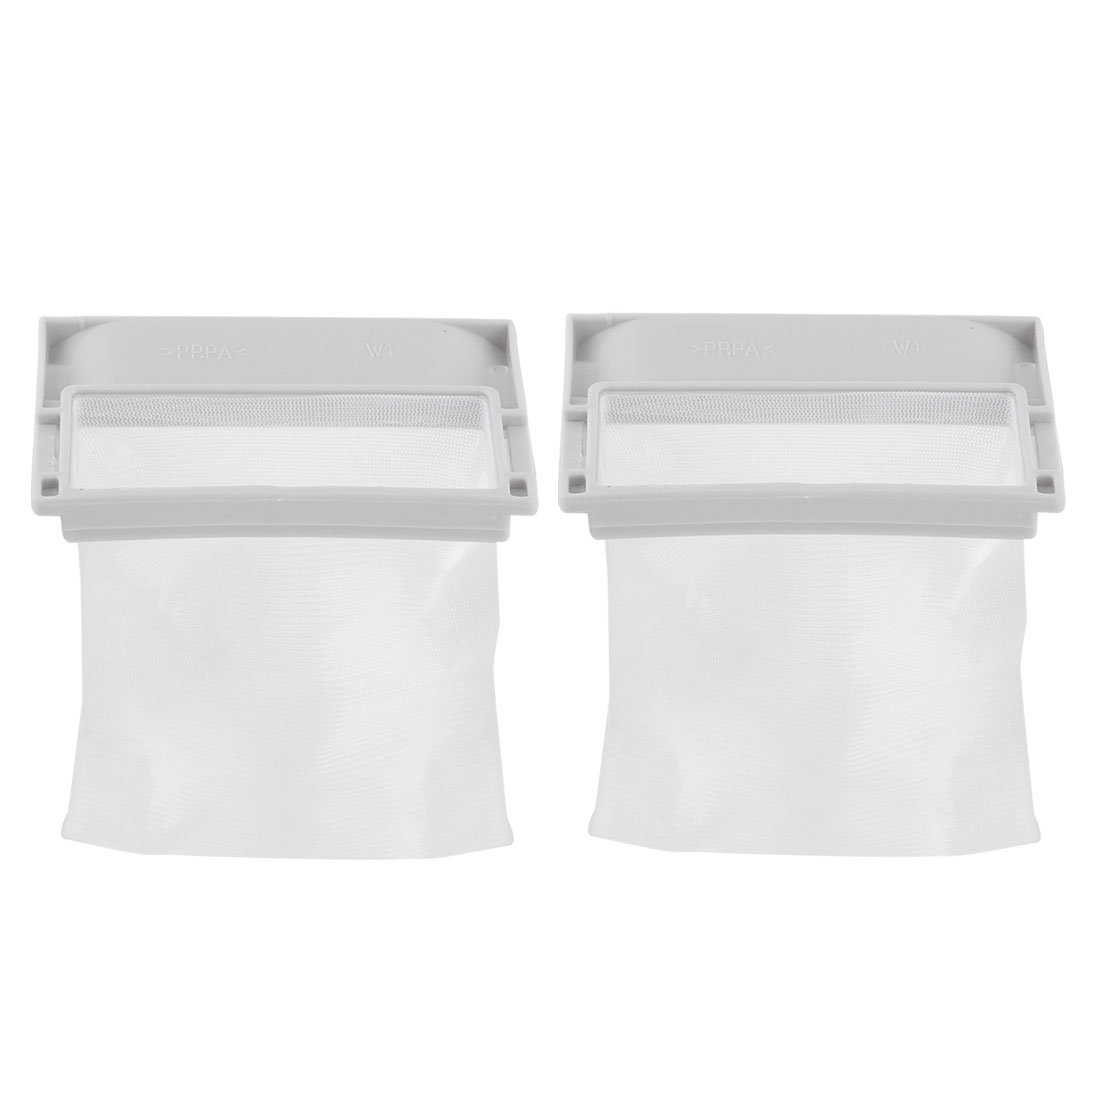 2 Pcs Plastic Shell Nylon Mesh Filter Bag for Haier Panasonic Washing Machine